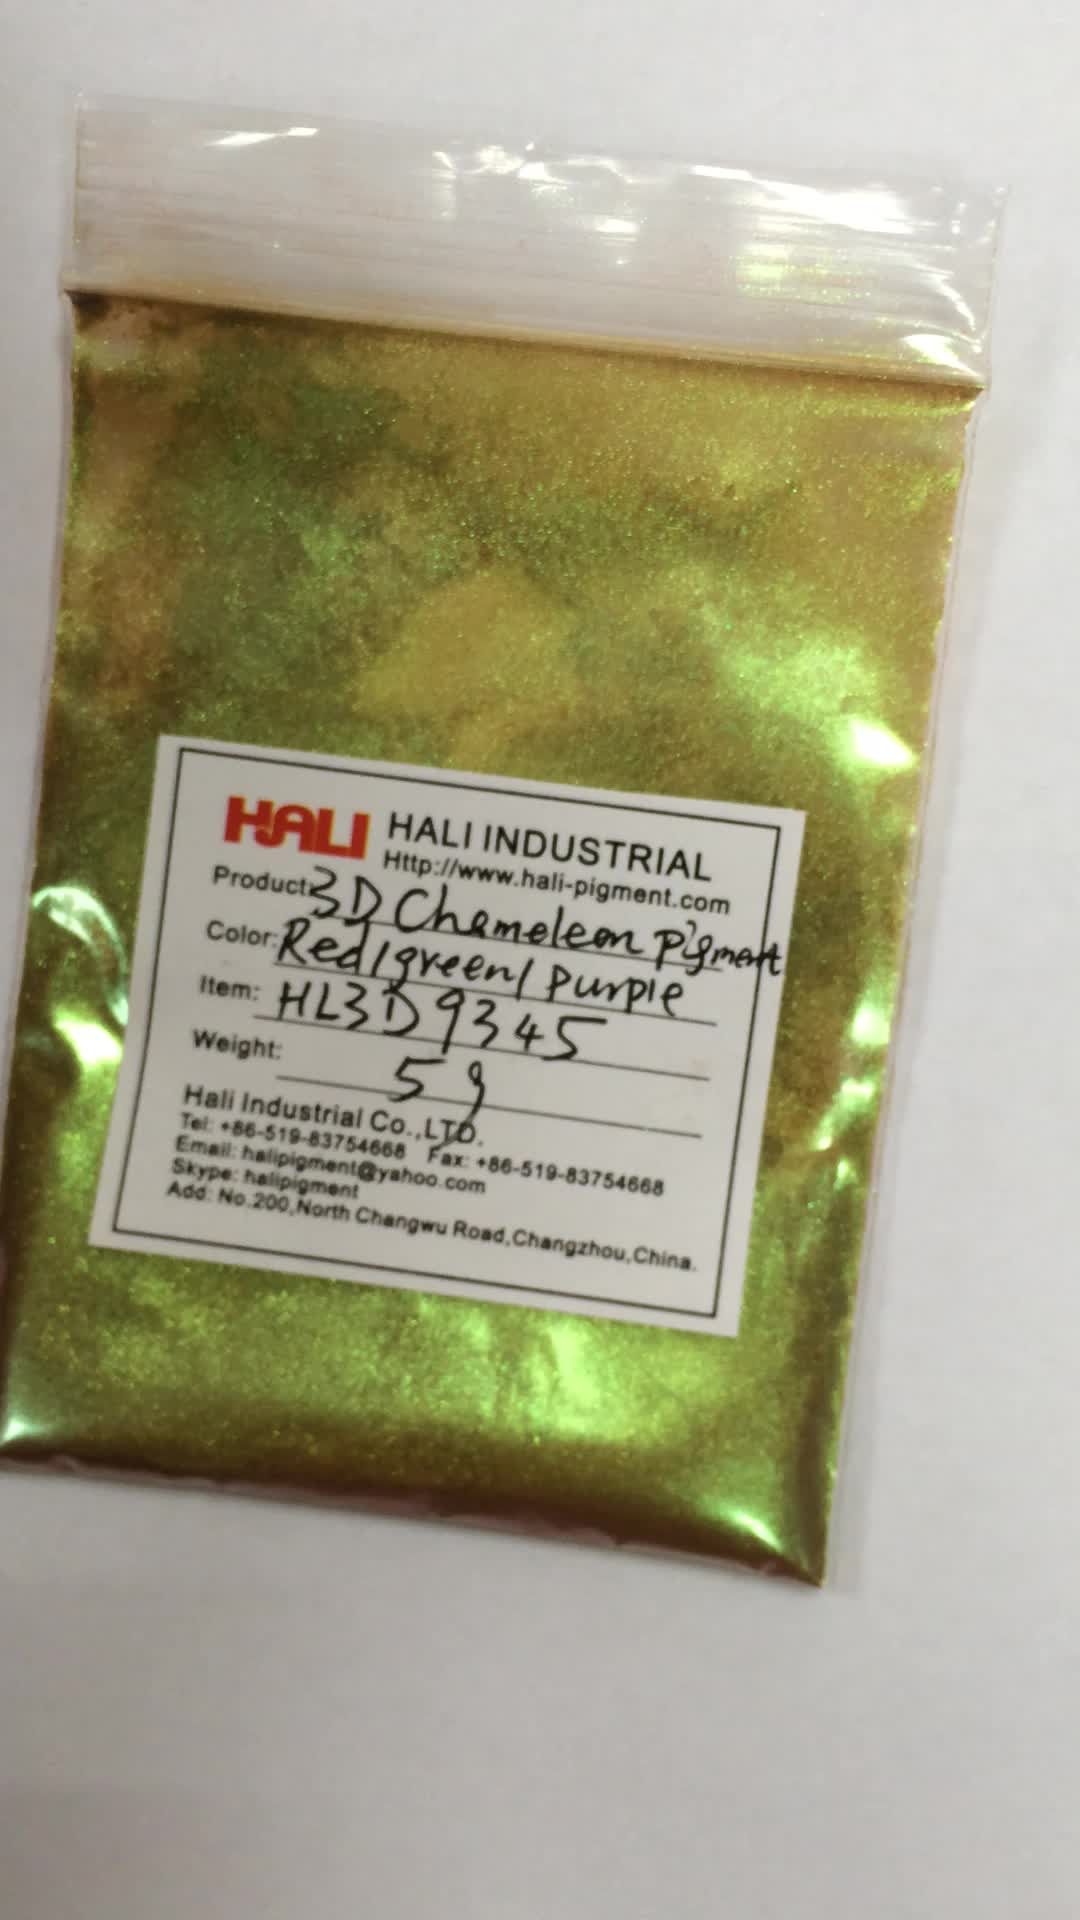 magnetic nail polish pigment,3D chameleon magic powder,item:HL3D9345,color:red/green/purple